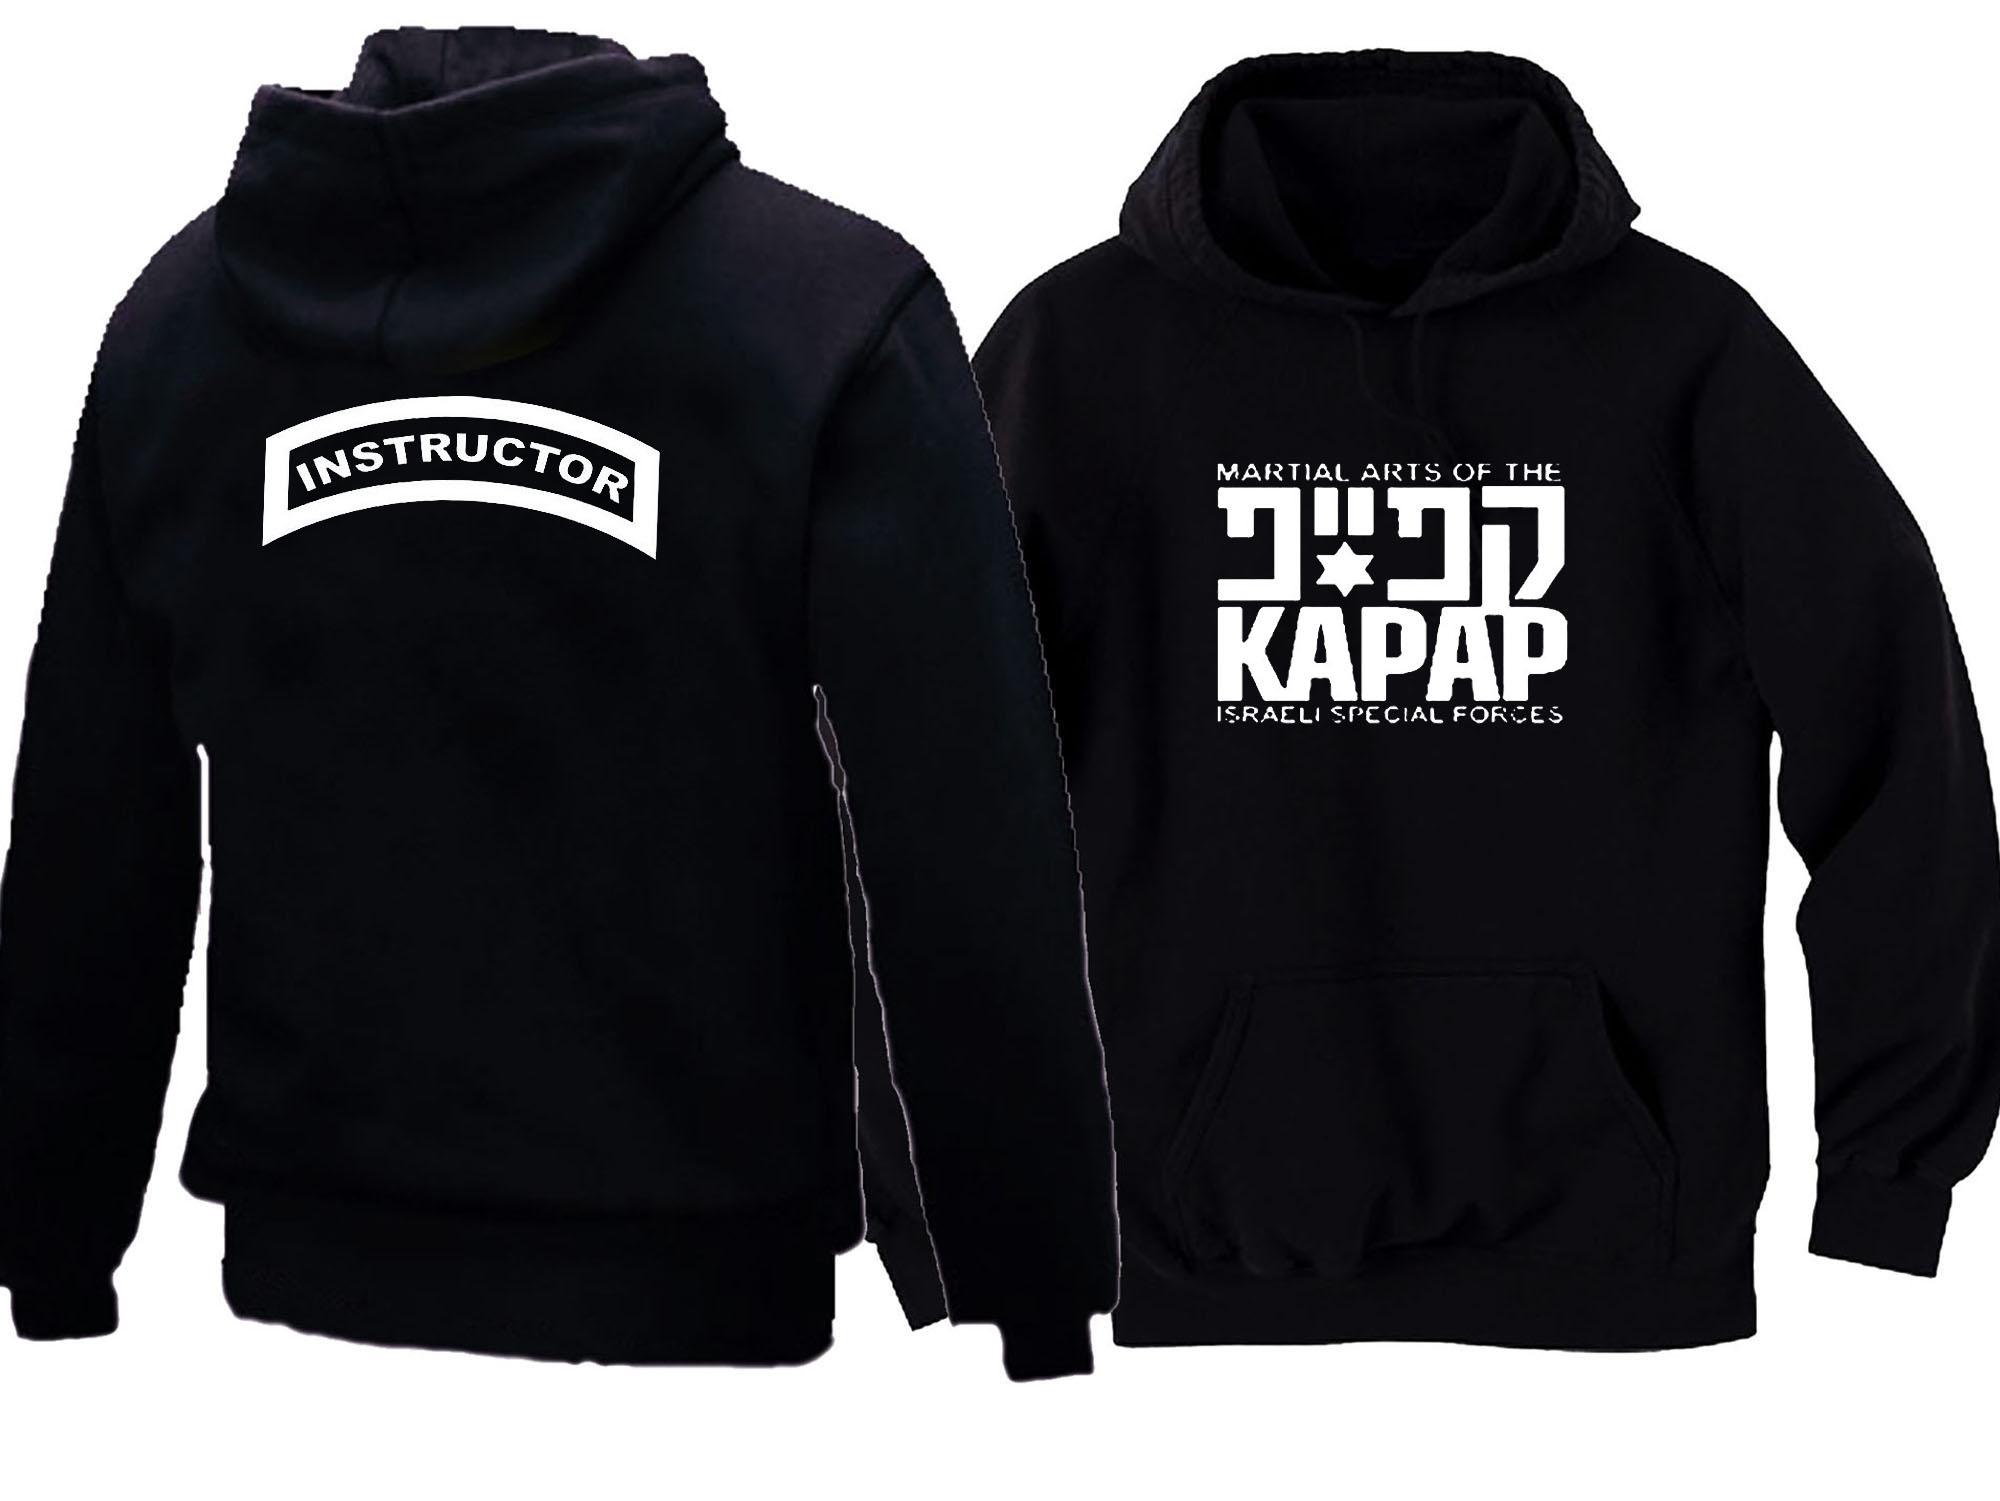 Krav Maga Israel Defence Martial Combat Black Hoodie Pull Over Hooded Sweatshirt